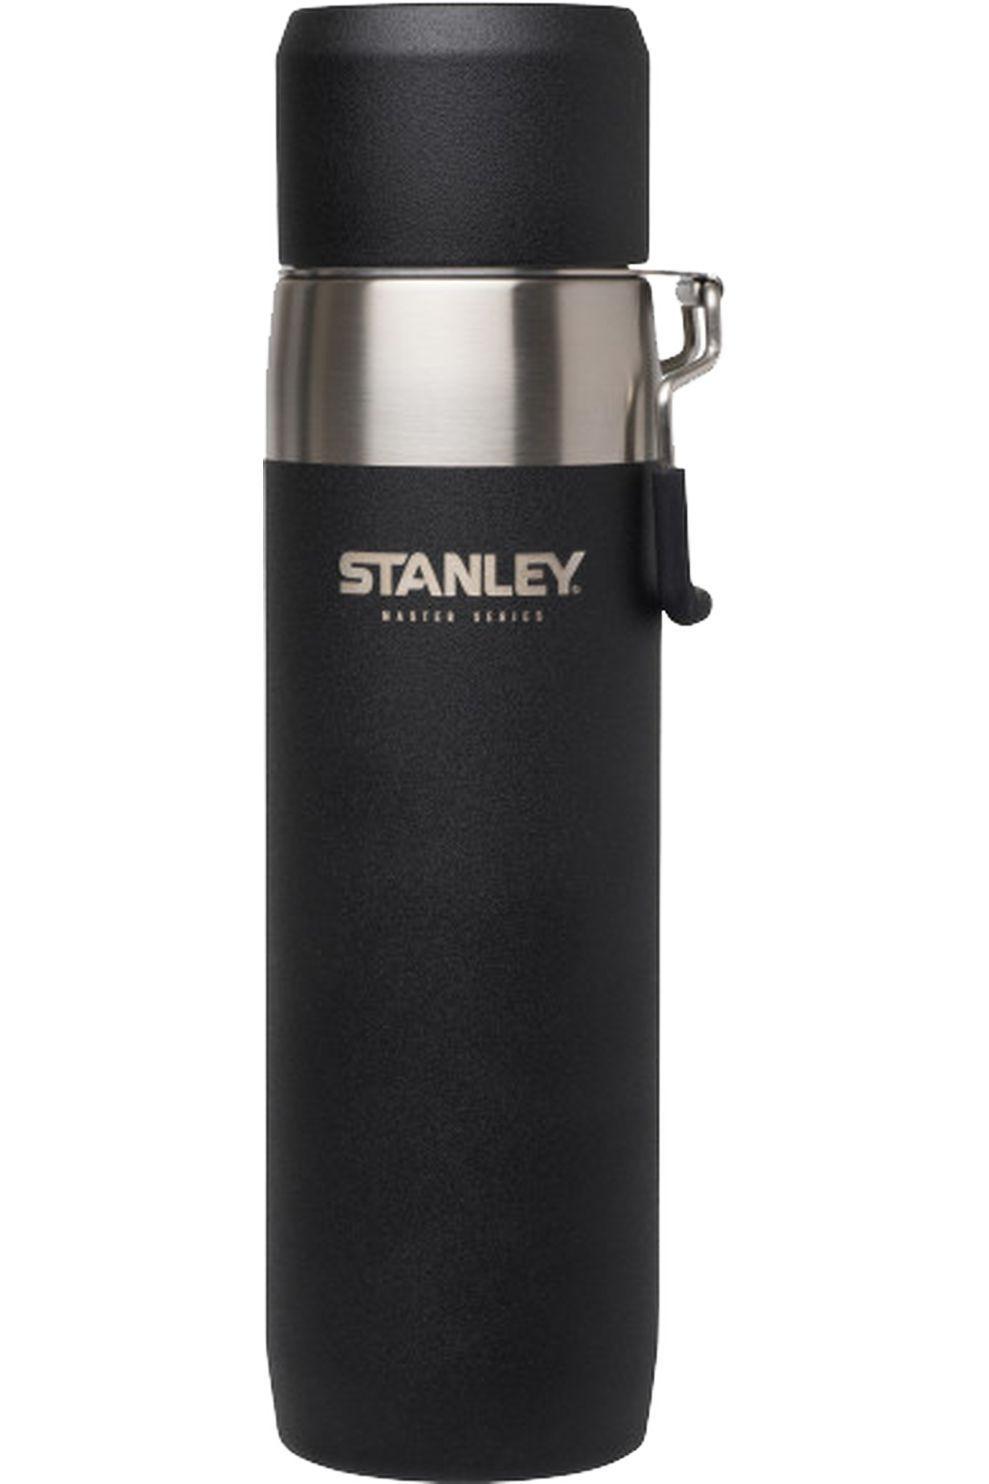 Stanley Drinkfles Master Vacuum Water Bottle 0,65L - Zwart